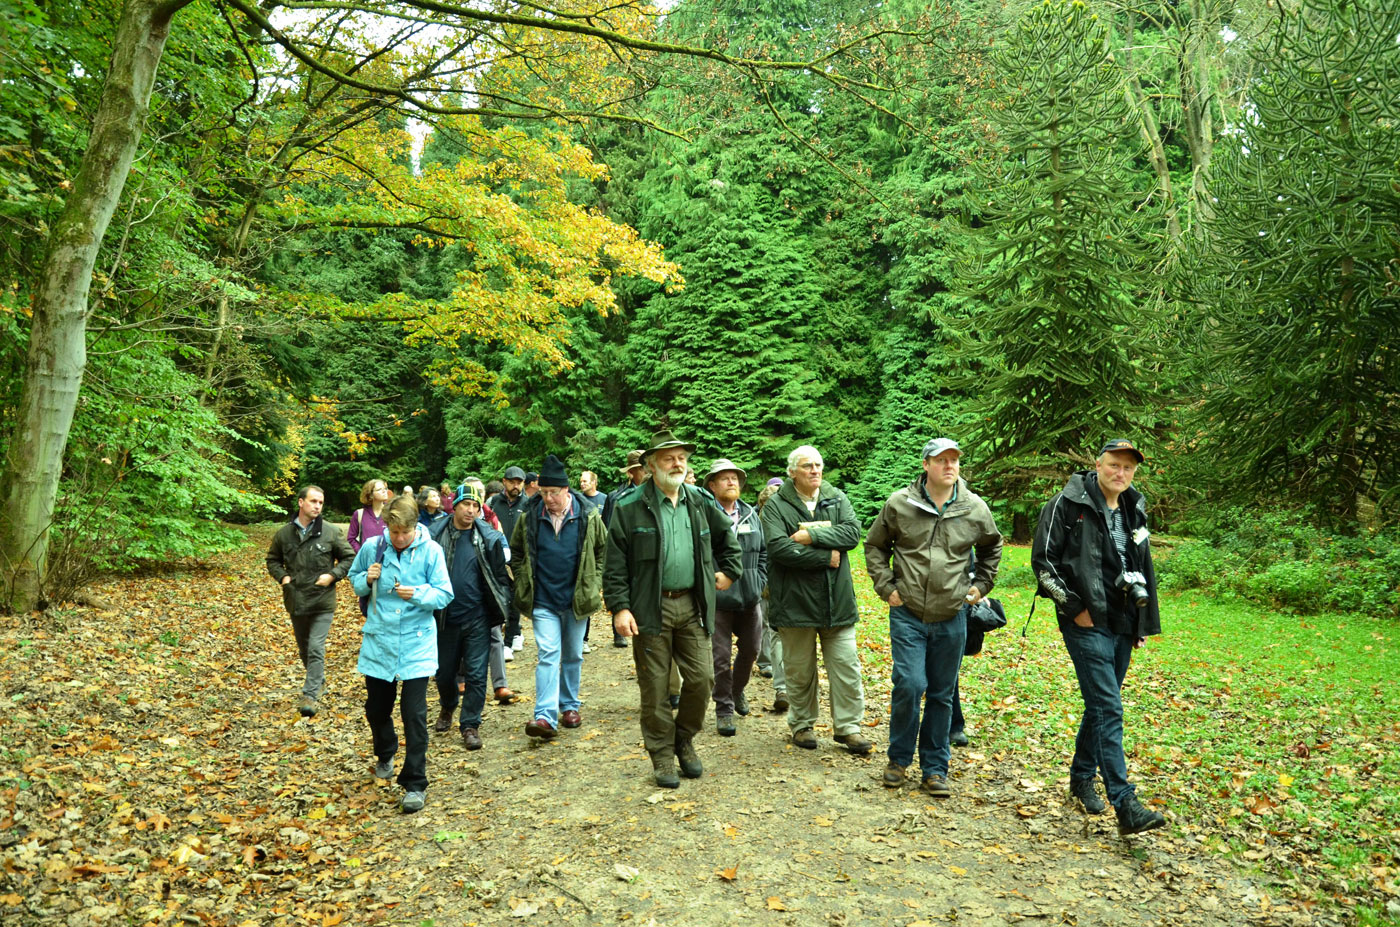 Wilfried Emmerechts guiding the PGG members at Tervuren Arboretum